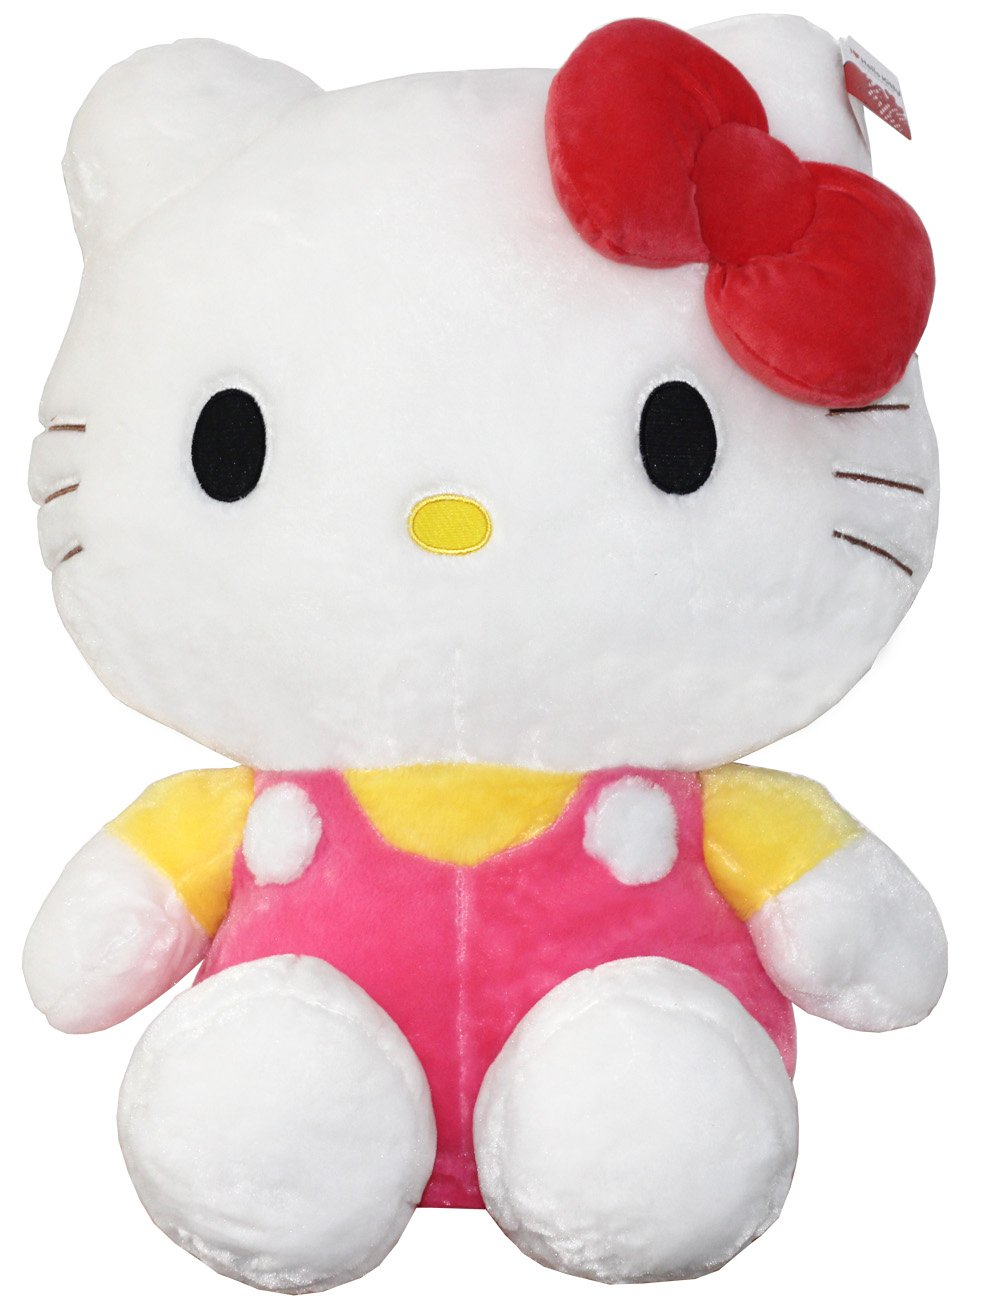 hello kitty凯蒂猫 毛绒玩具公仔可爱kt猫 (坐高60cm